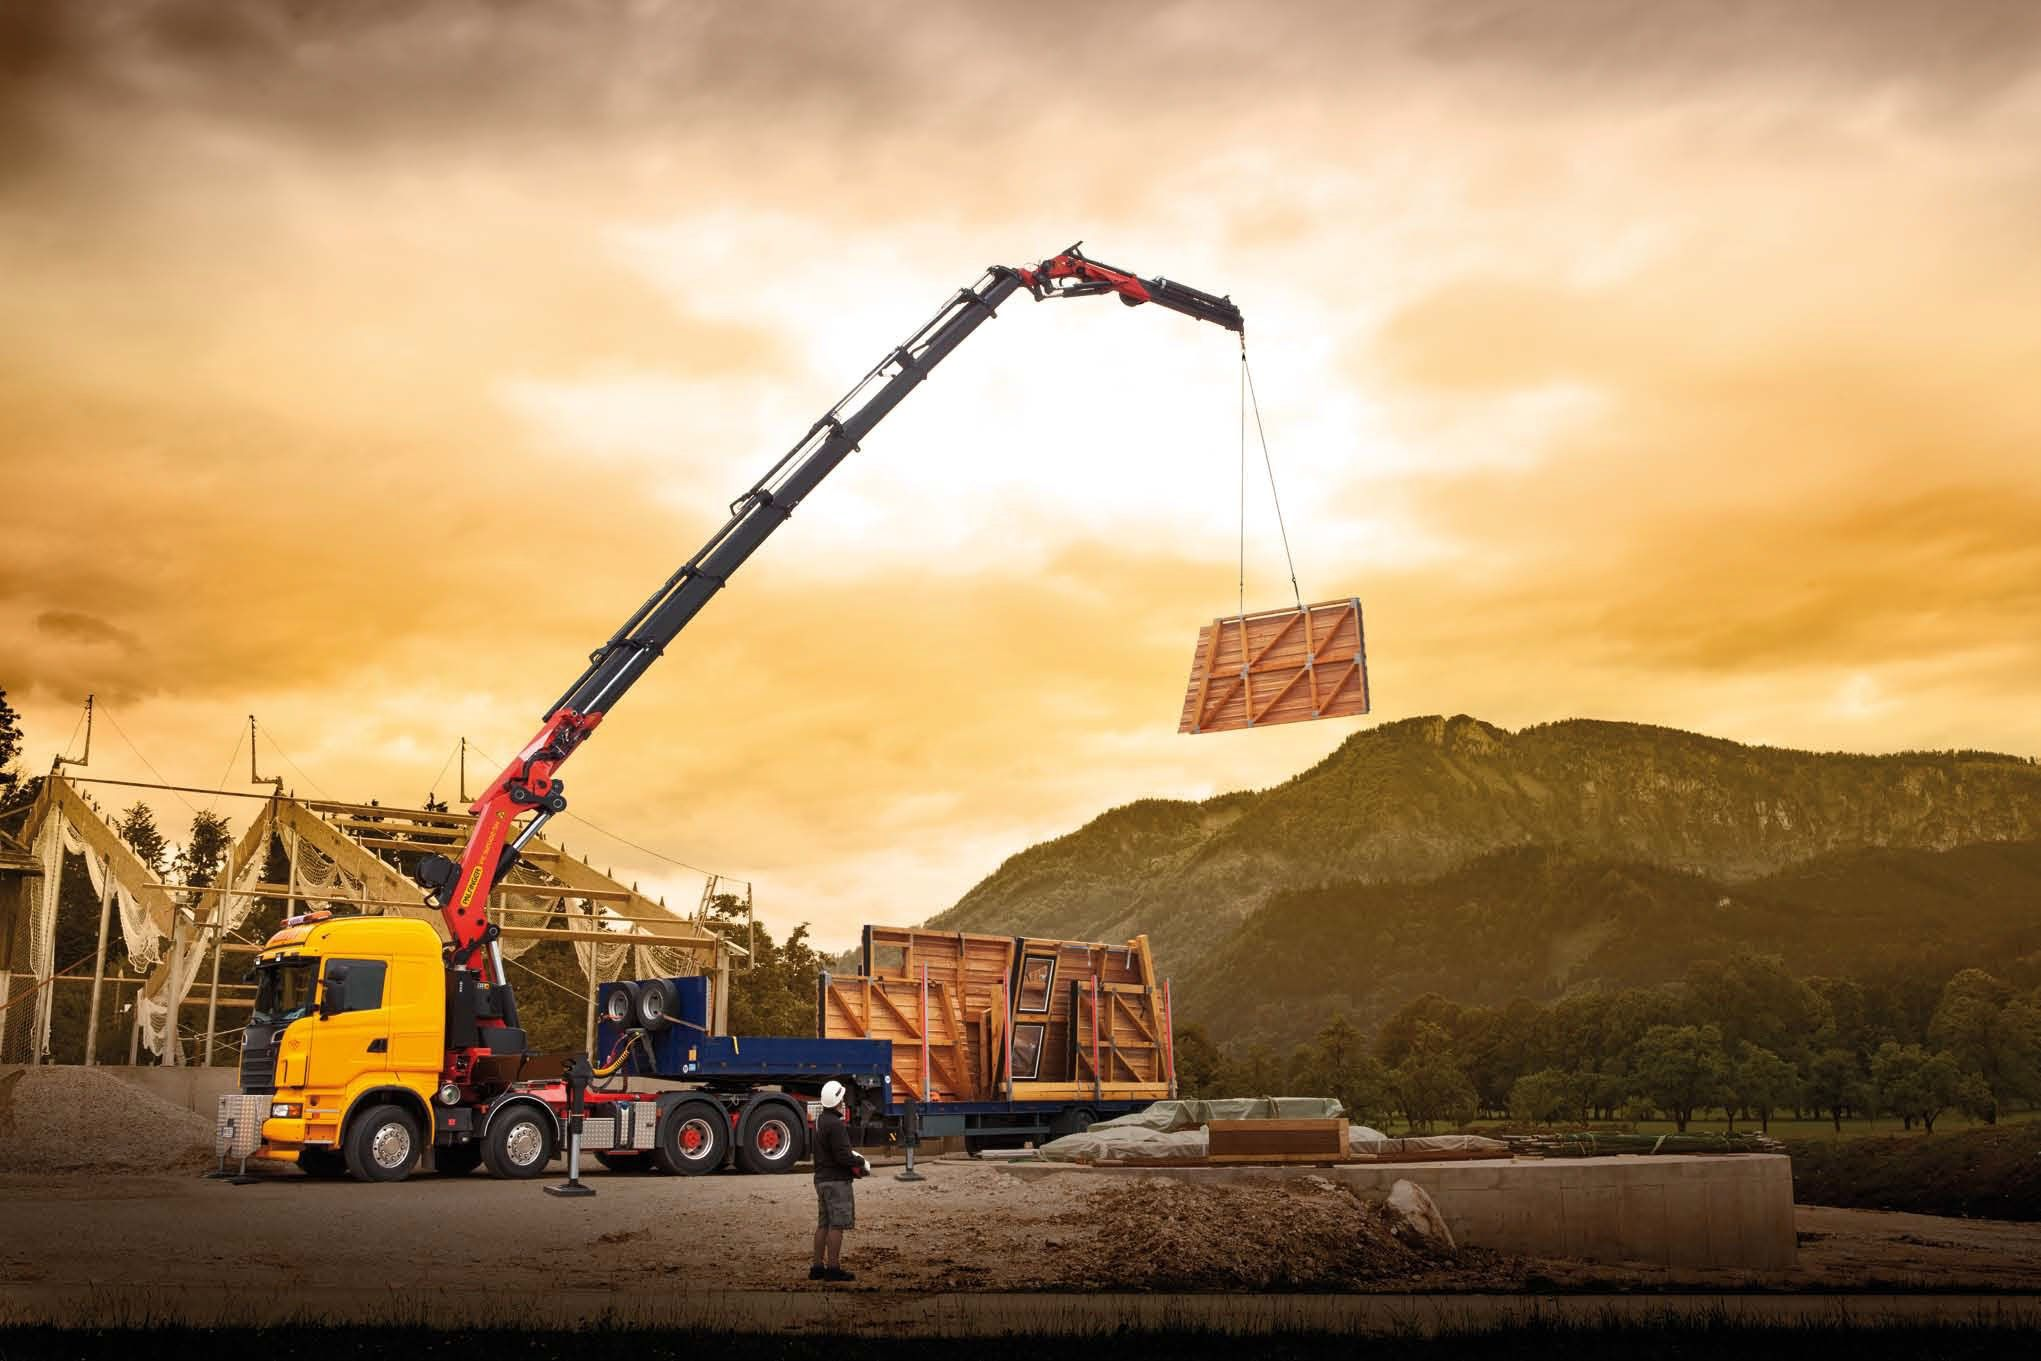 MOBILE CRANE construction truck semi tractor ariel cranes